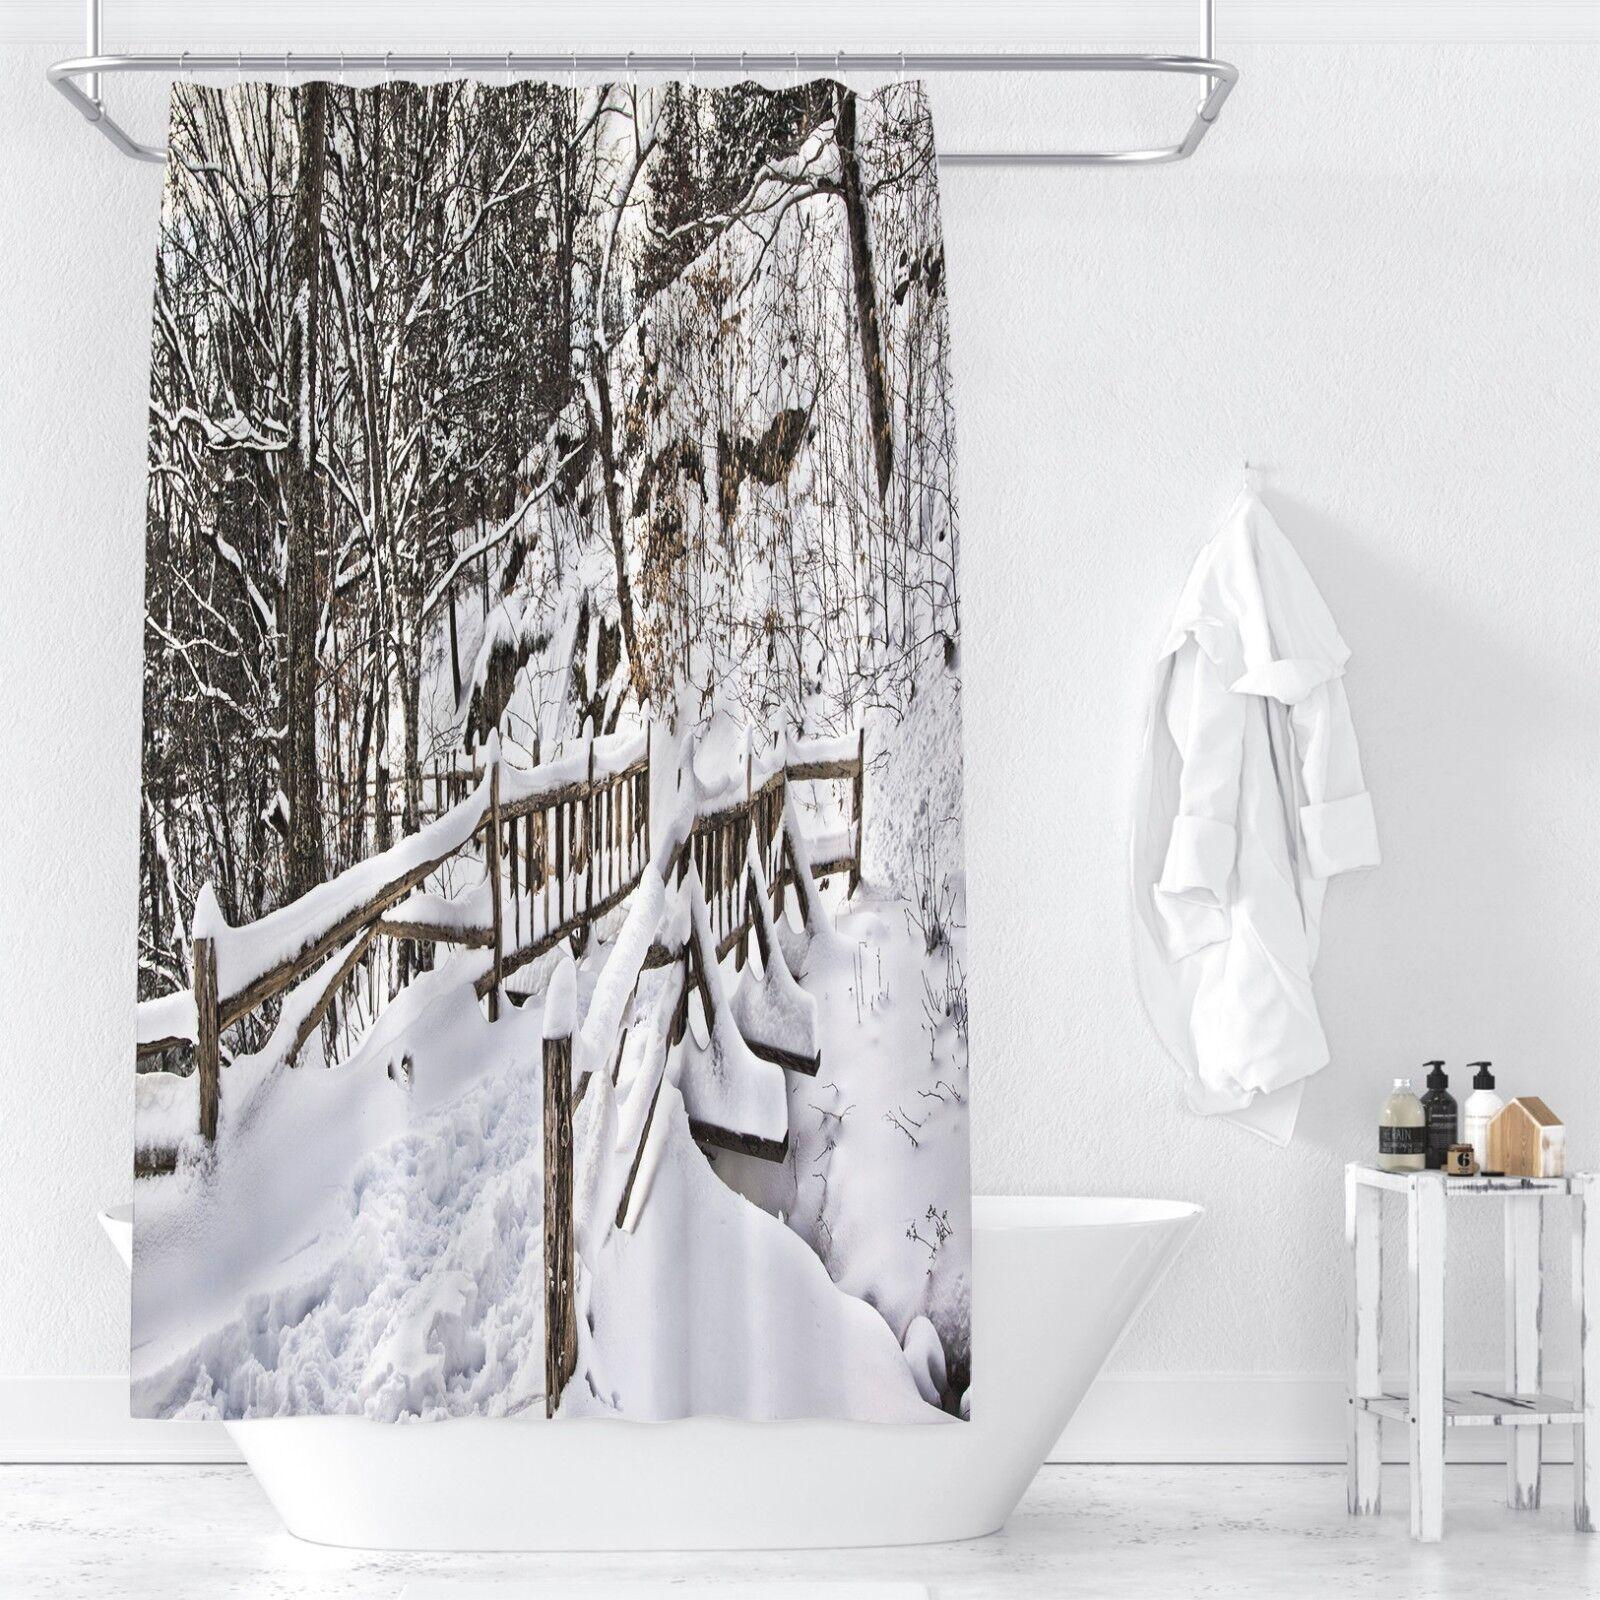 3D Scena neve 32 Tenda da doccia IMPERMEABILE Fibra Bagno WC CASA FINESTRE